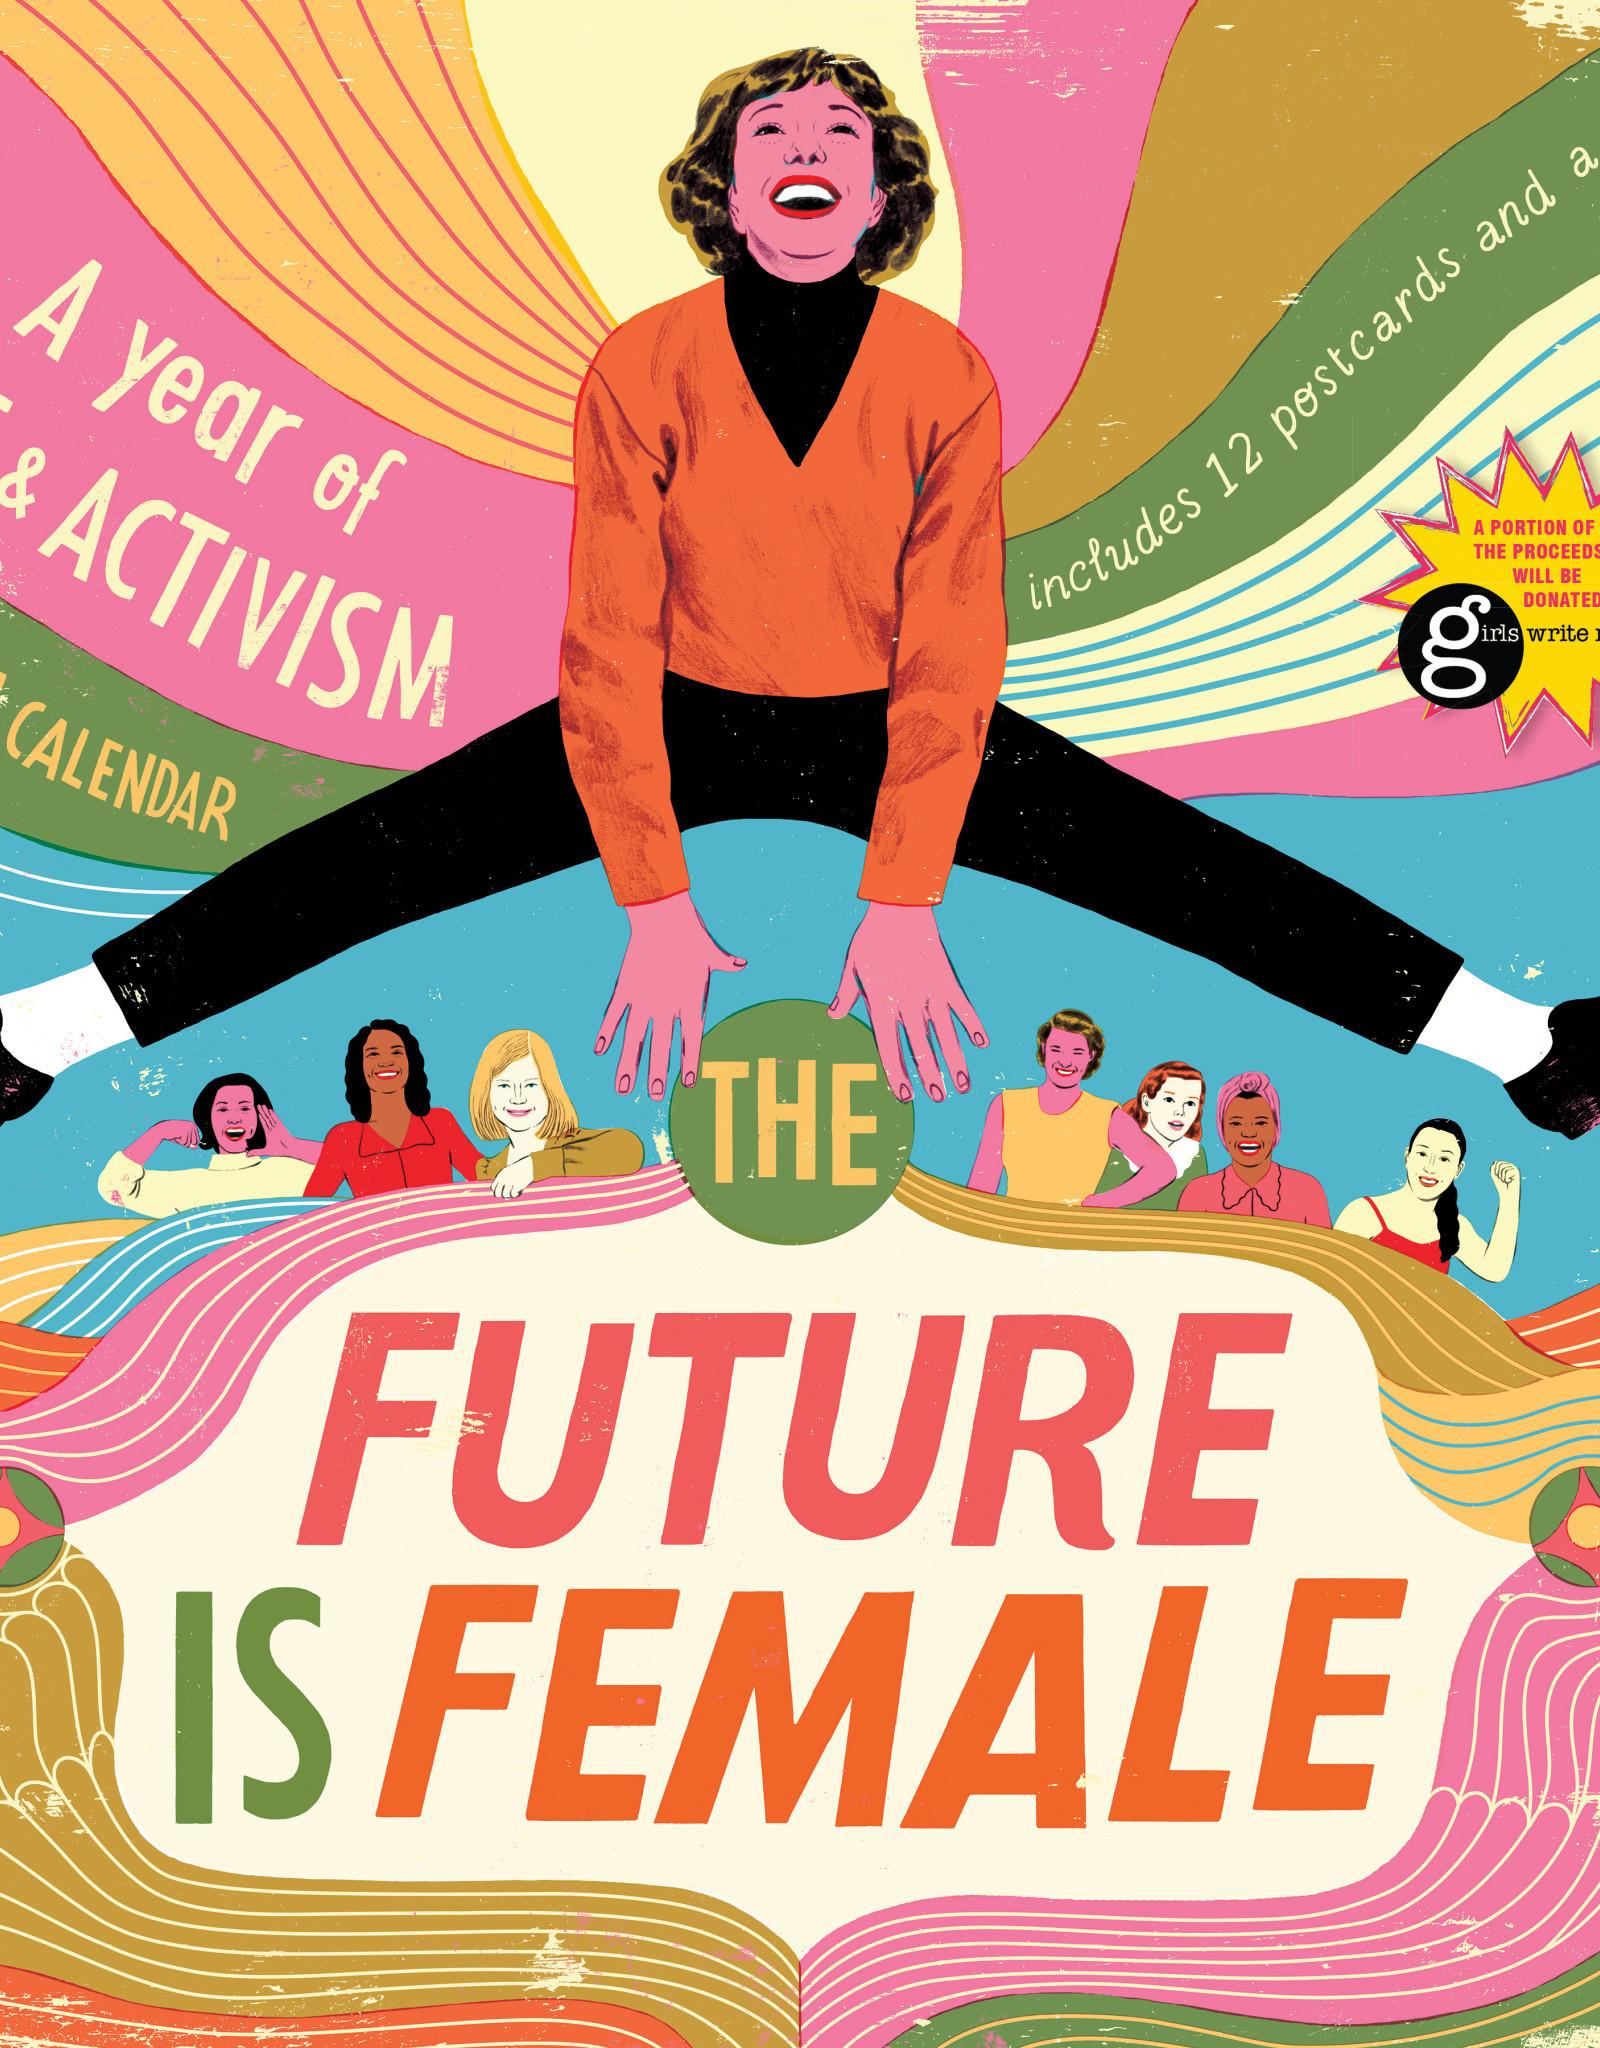 2021 Wall Calendar: The Future is Female